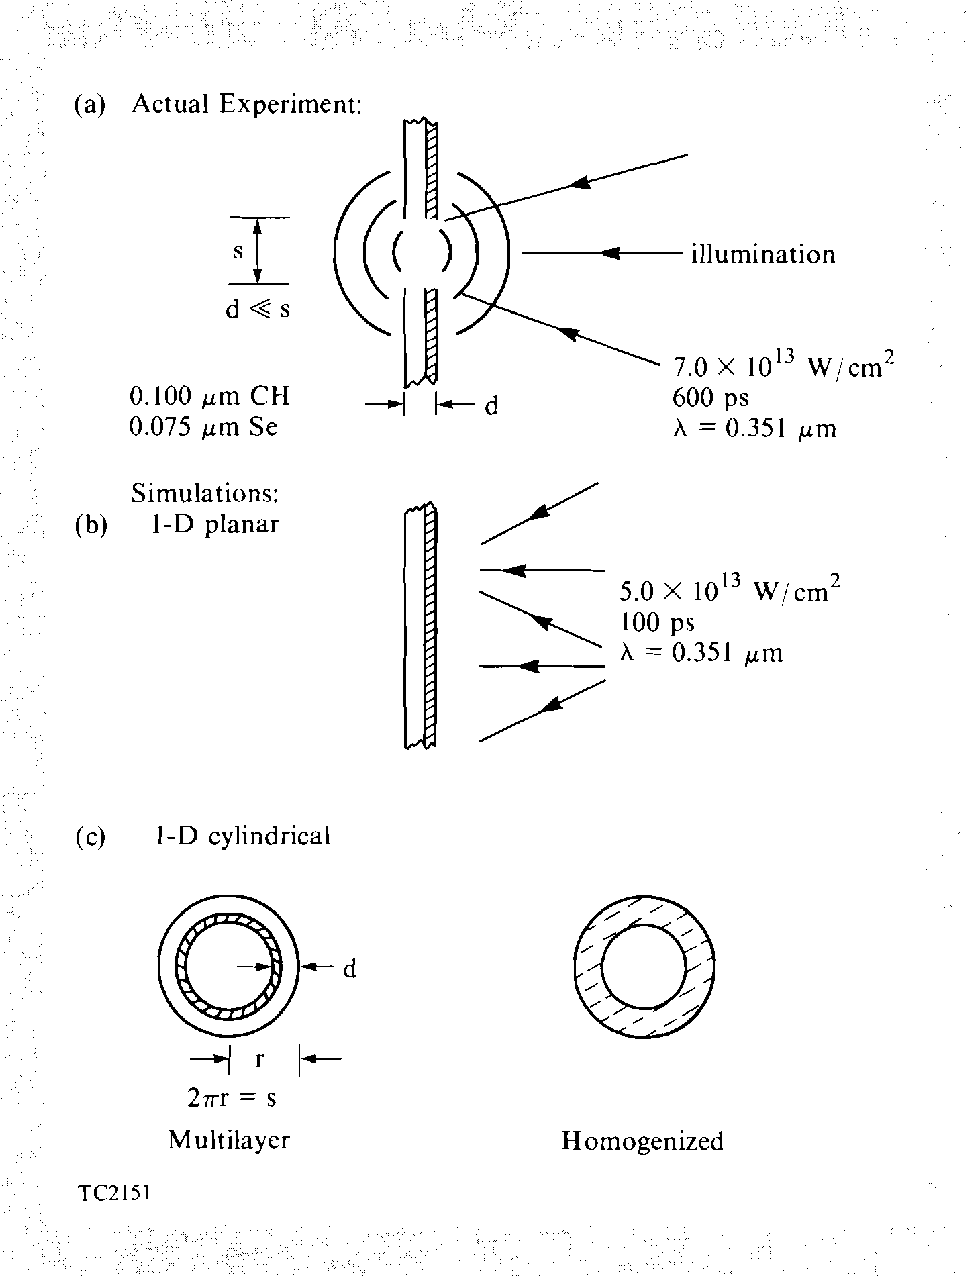 figure 33.16